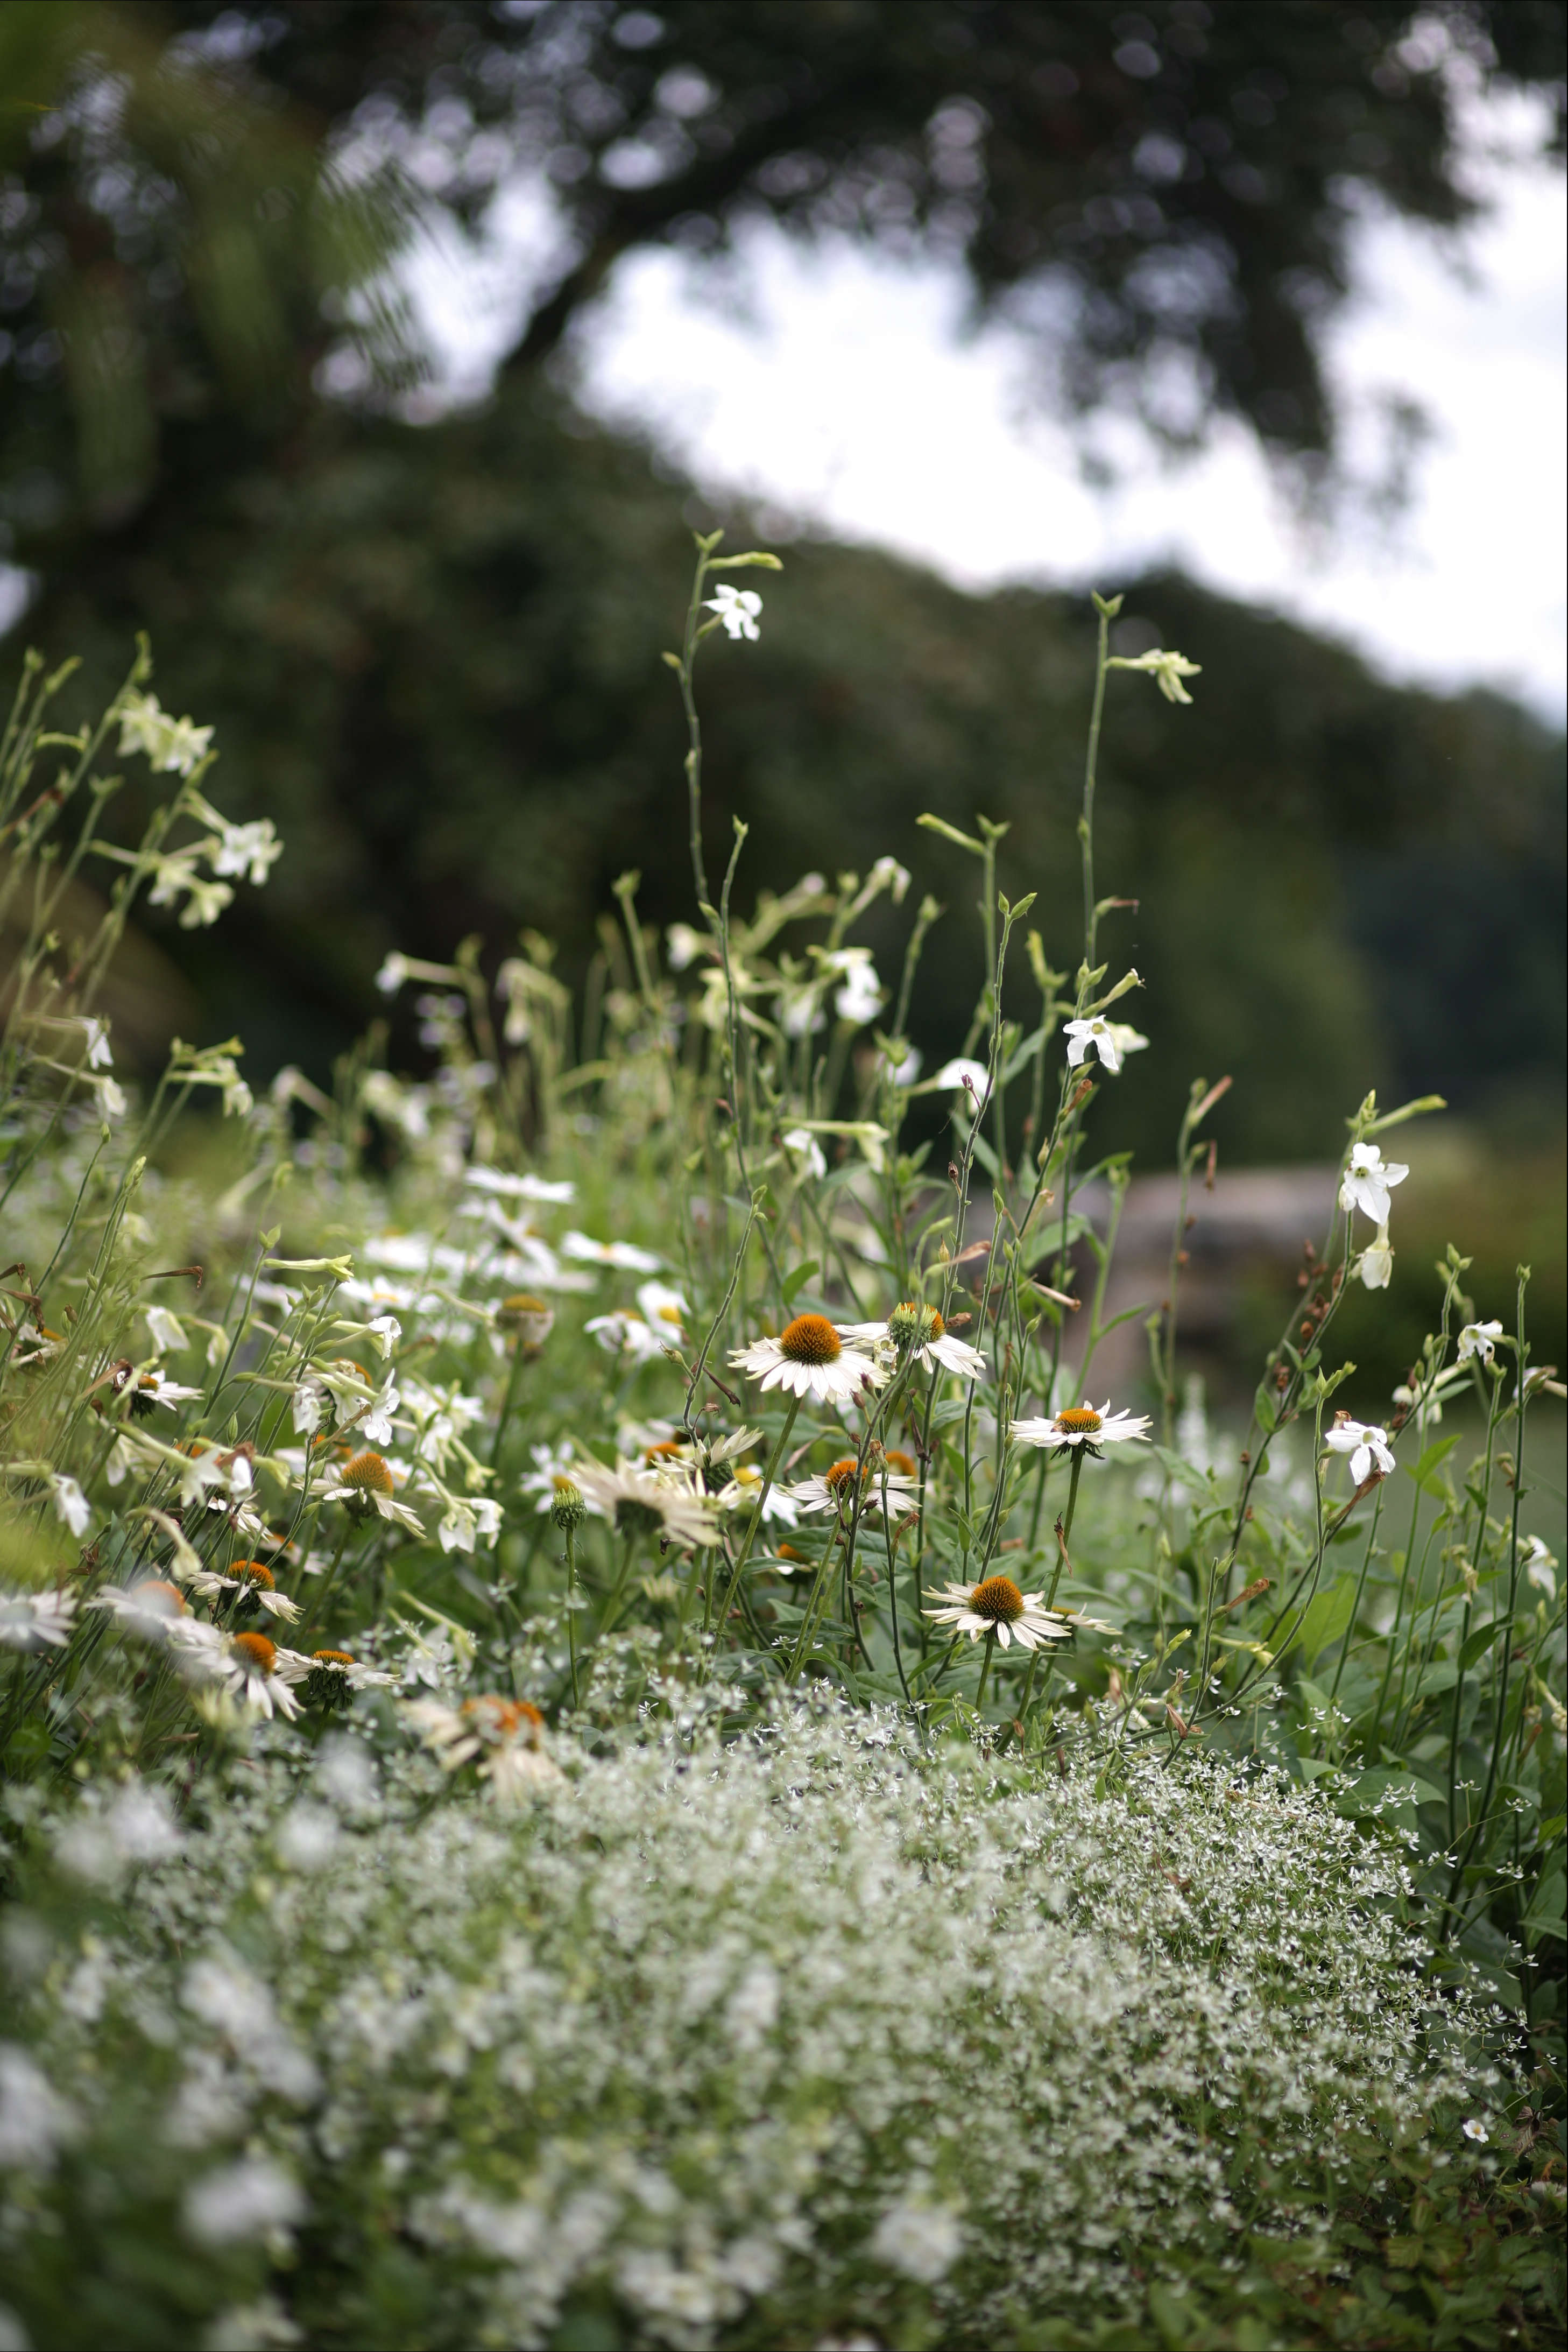 Backyard Flower Farmer : Spring Ahead 10 Tips To Get Your Garden Ready Gardenista